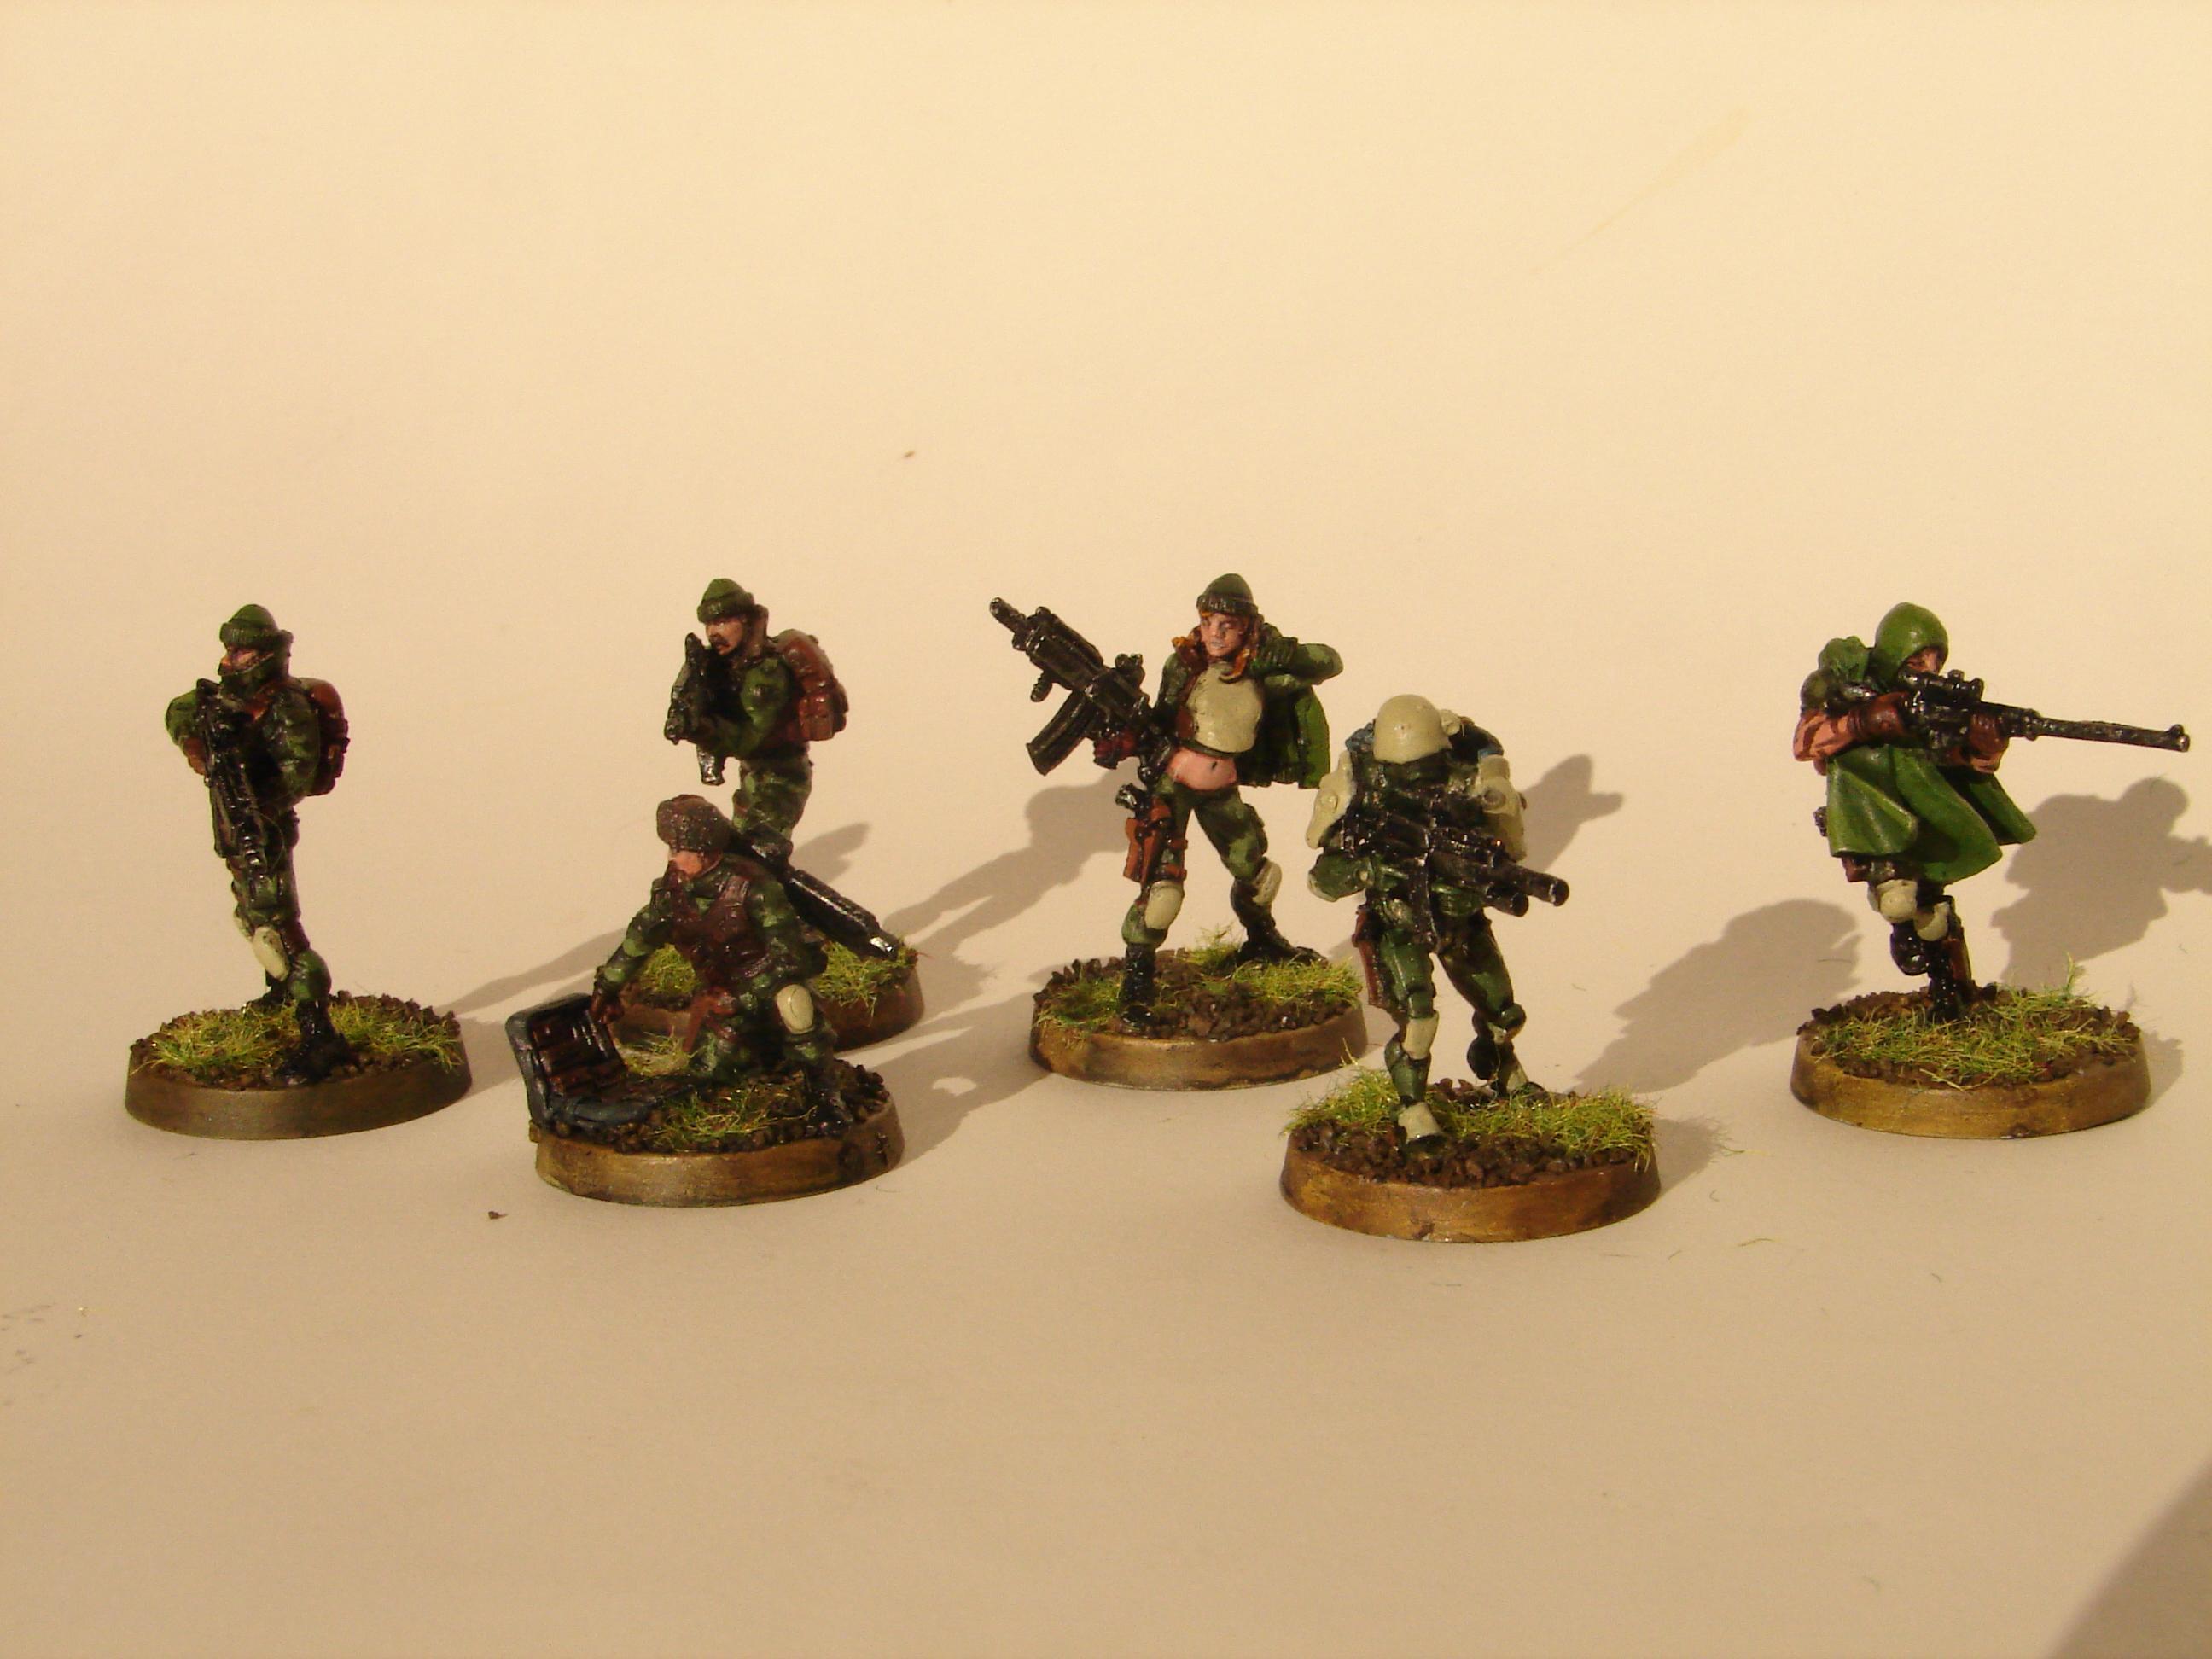 Ariadna, Infinity, Kozaks, Scouts